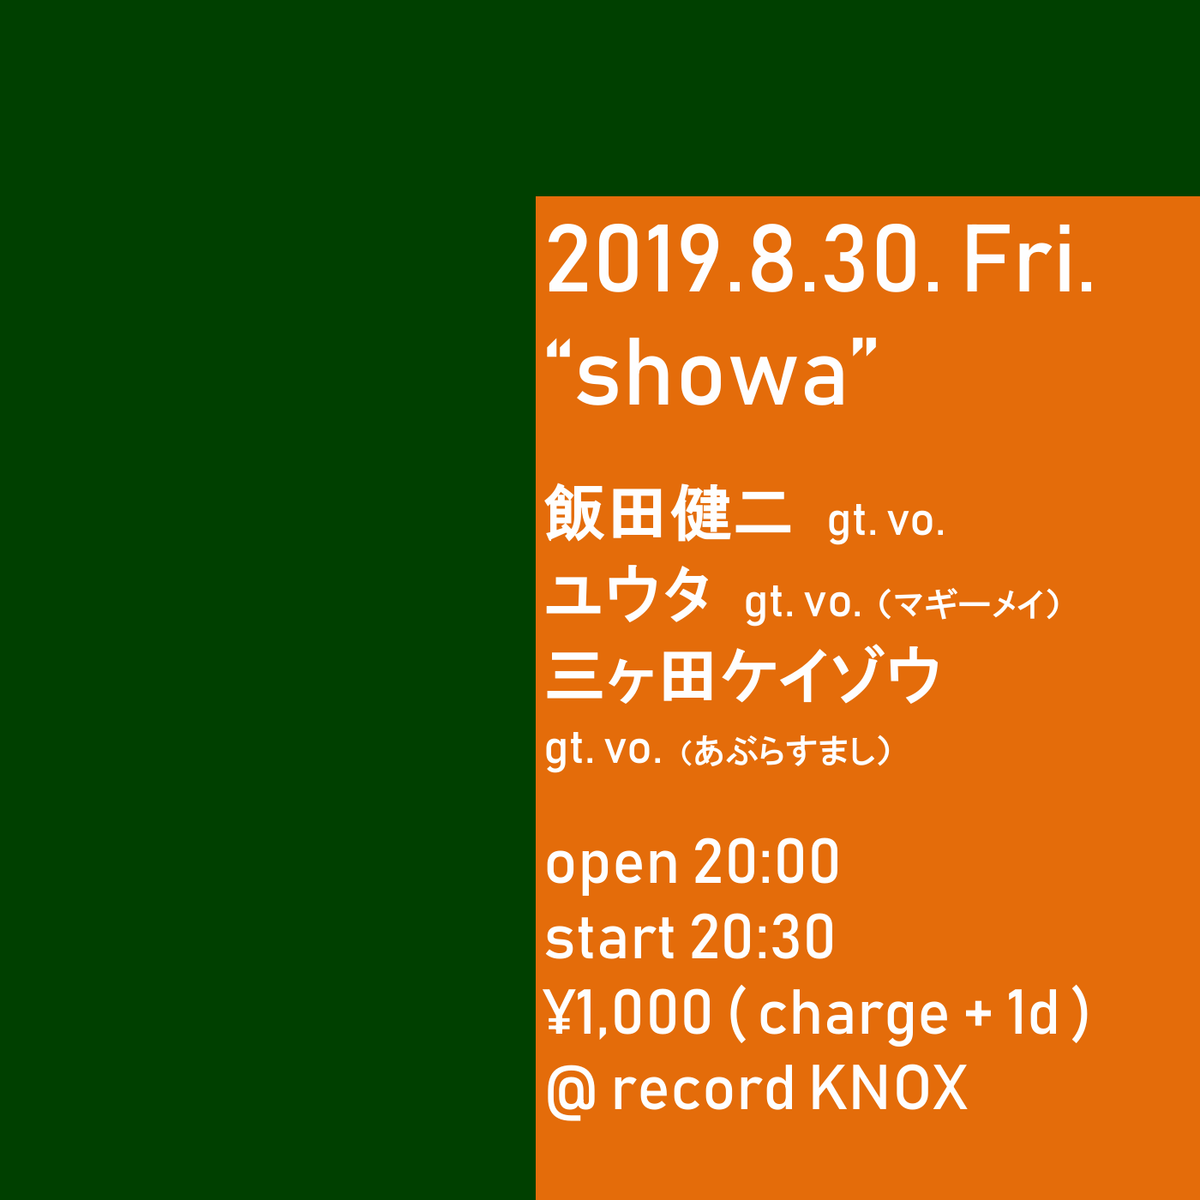 f:id:AzemichiKozou:20190711172153p:plain